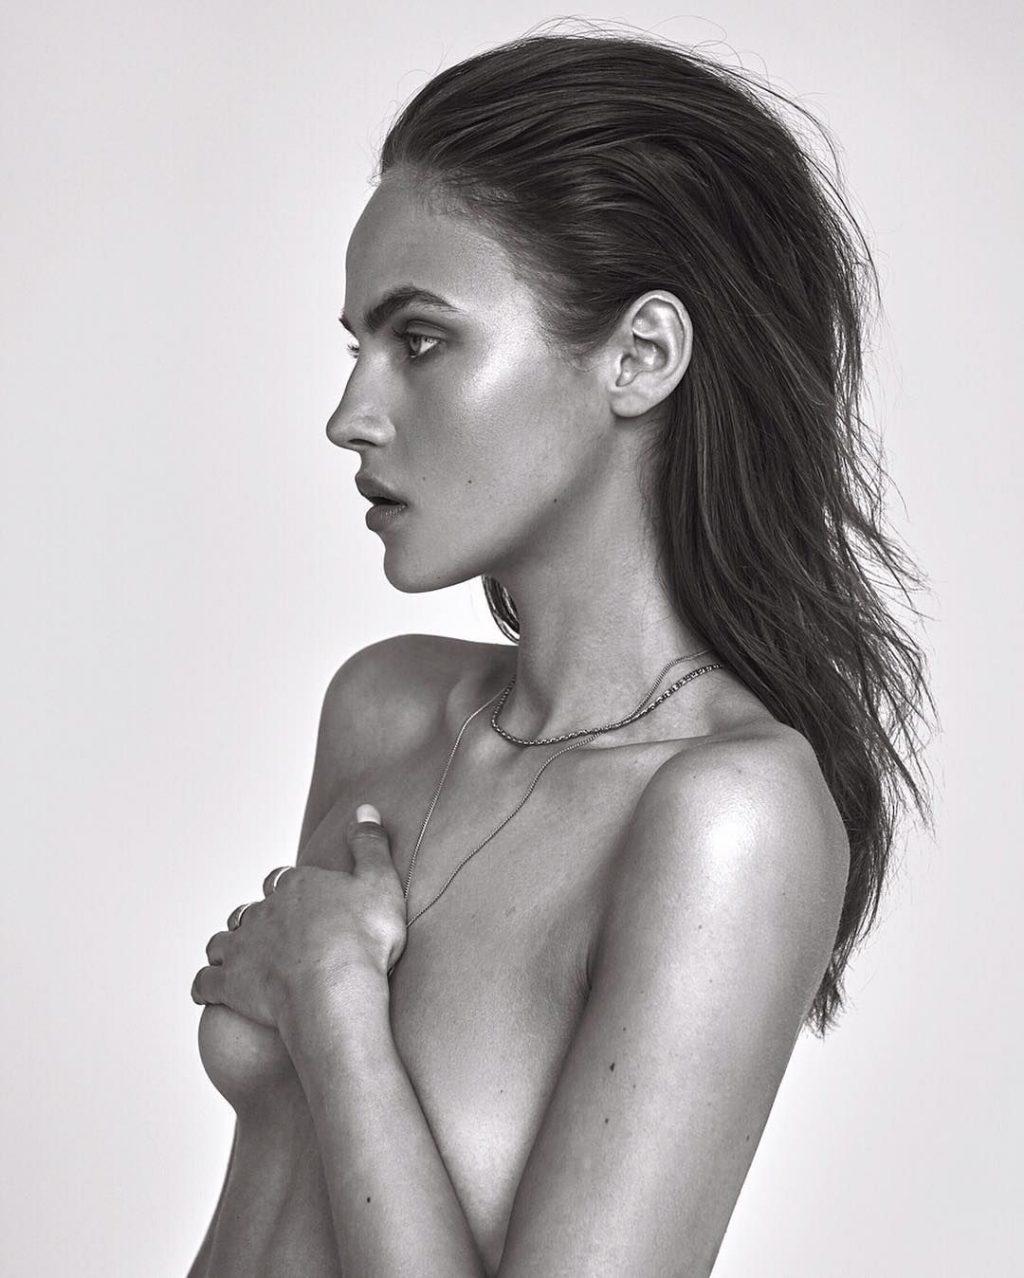 Elena carriere nude